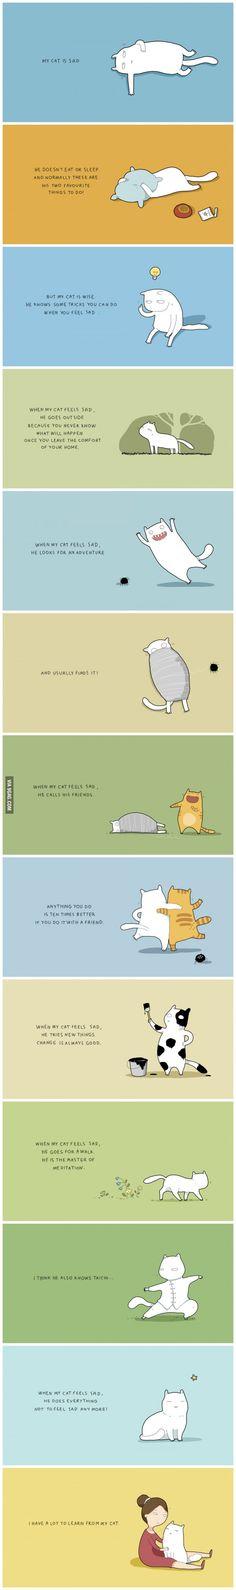 When my cat feels sad (by Lingvistov)